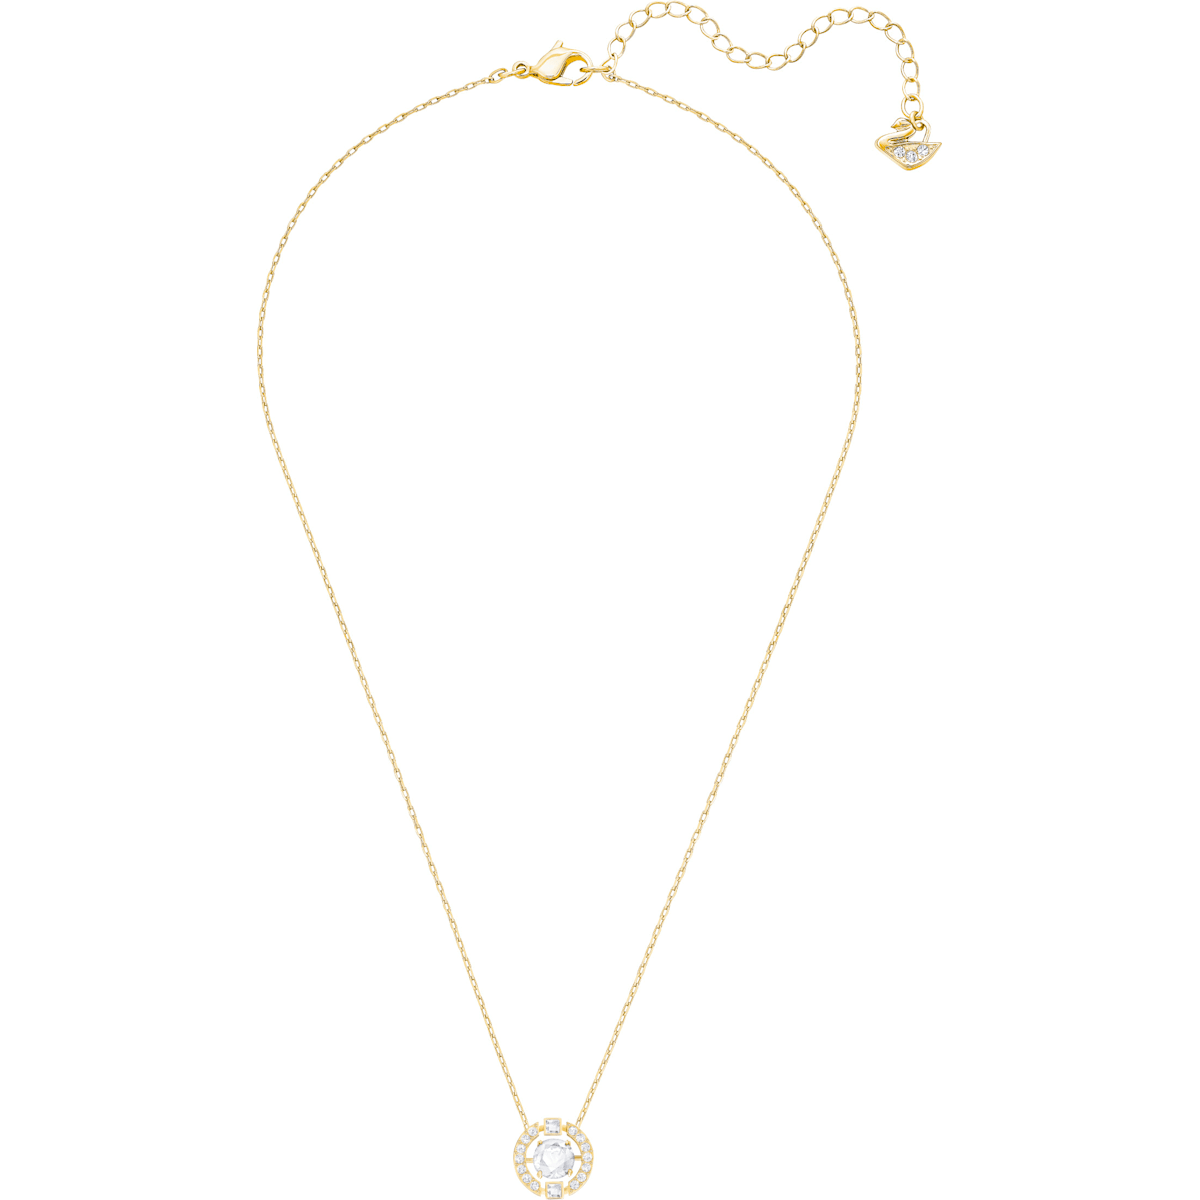 f9618c135940a Swarovski Sparkling Dance Round 項鏈, 白色, 鍍金色色調